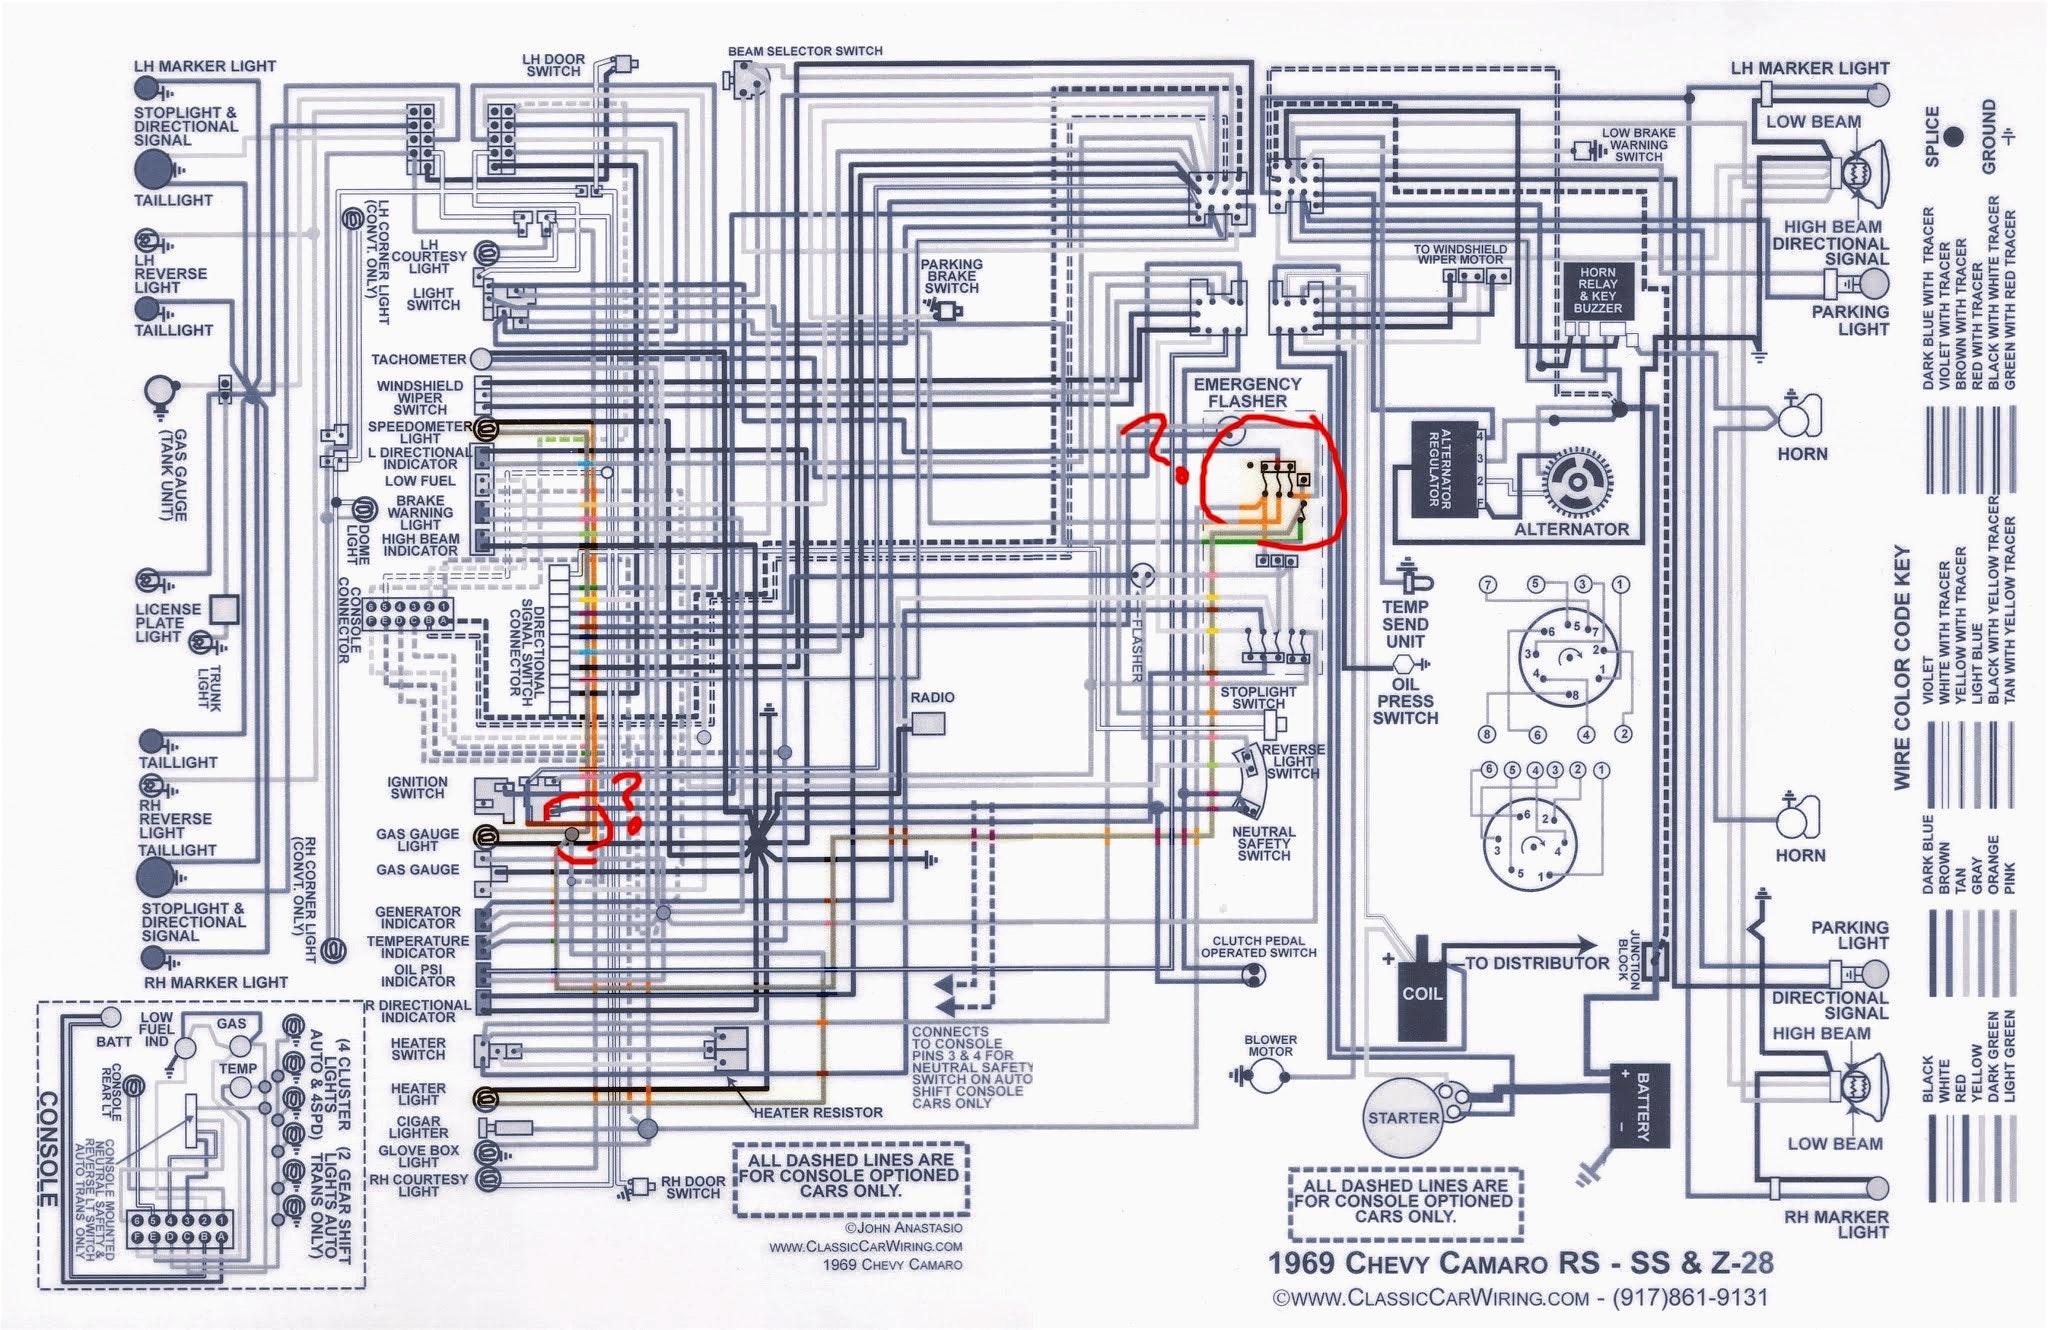 1967 Camaro Fuel Gauge Wiring Diagram 2002 Lexus Es 300 Fuse Box Mazda3 Sp23 2005vtx Jeanjaures37 Fr